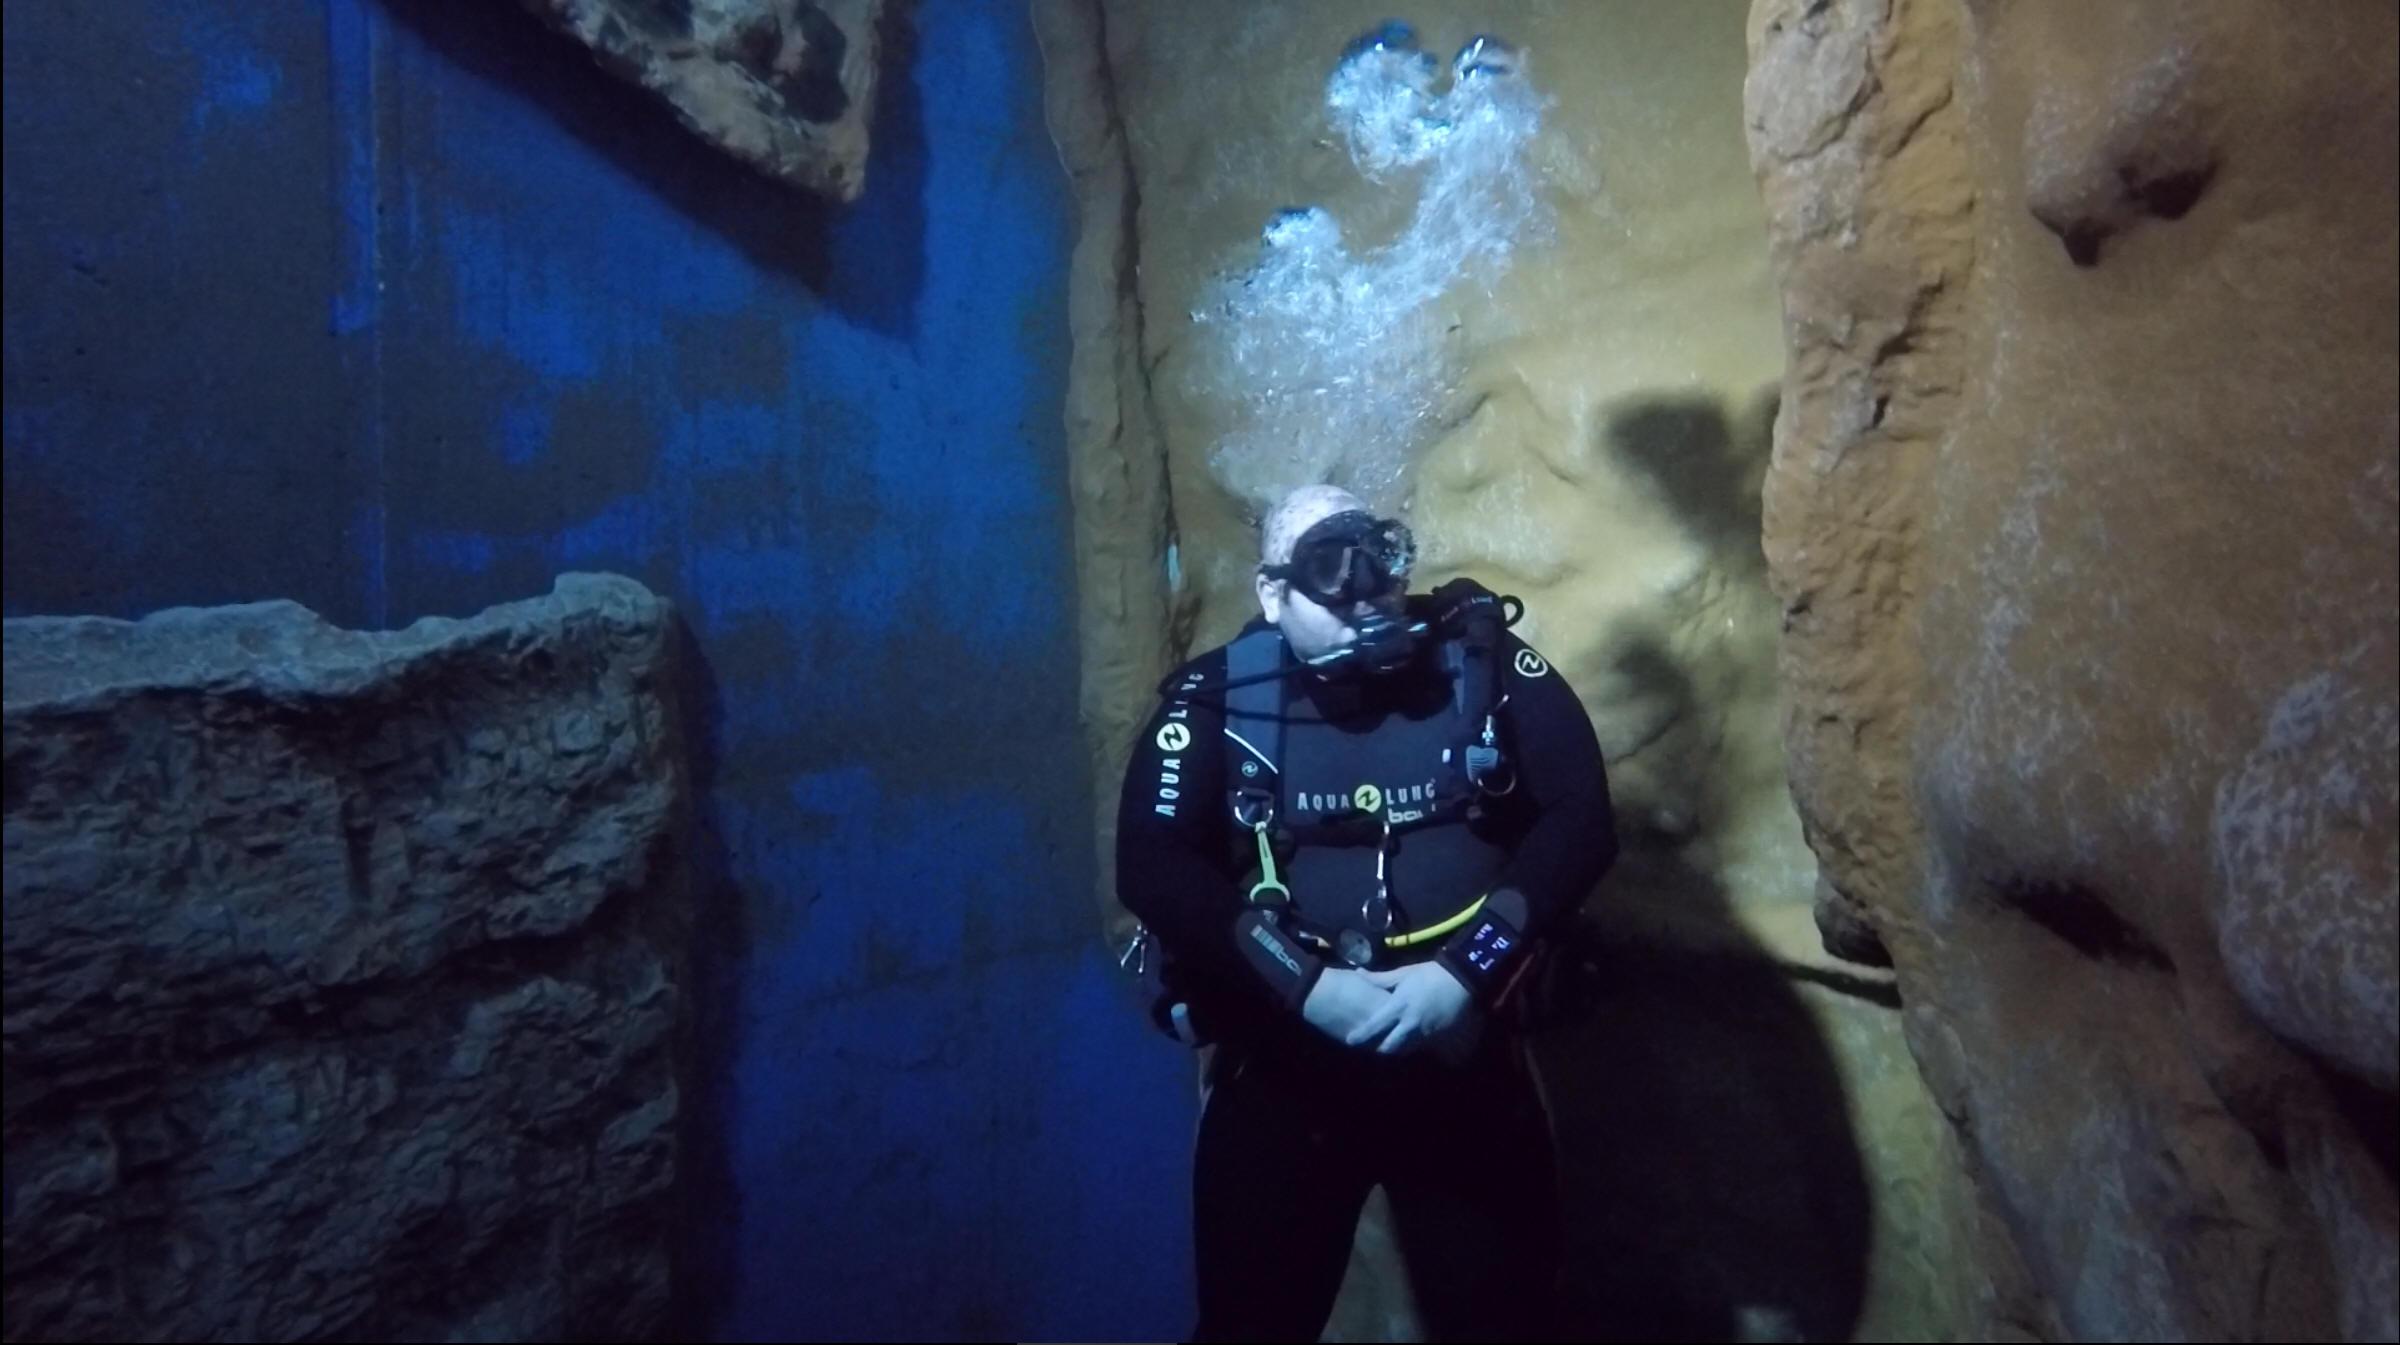 201801_CPS_Sortie Fosse Dive4Life_017